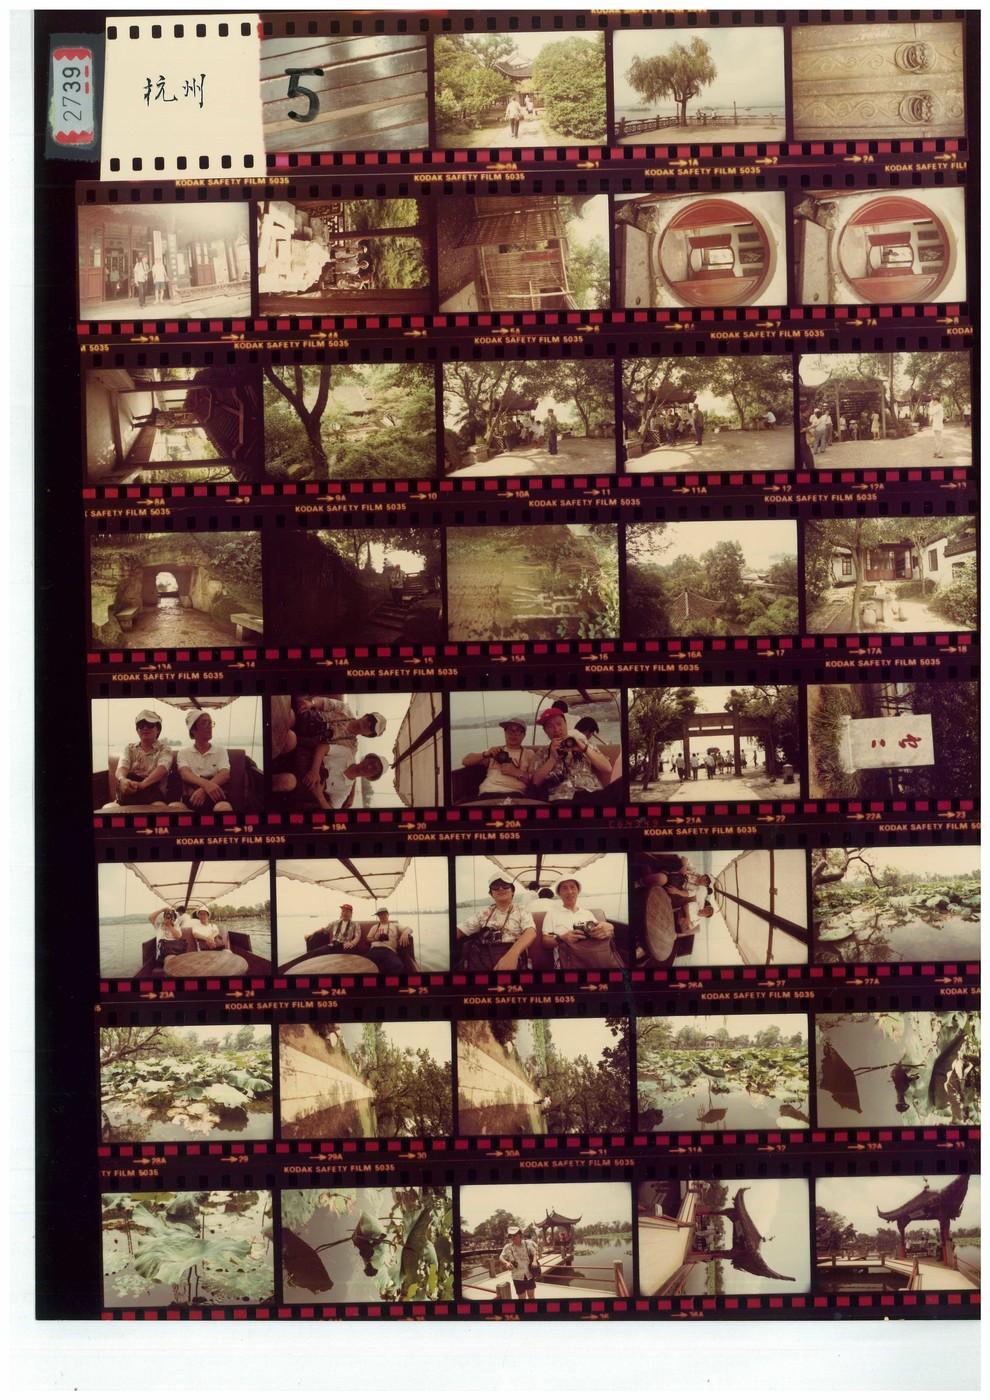 Ha Bik Chuen and three friends in Hangzhou, 1982. Courtesy of the Ha Bik Chuen family and Asia Art Archive.